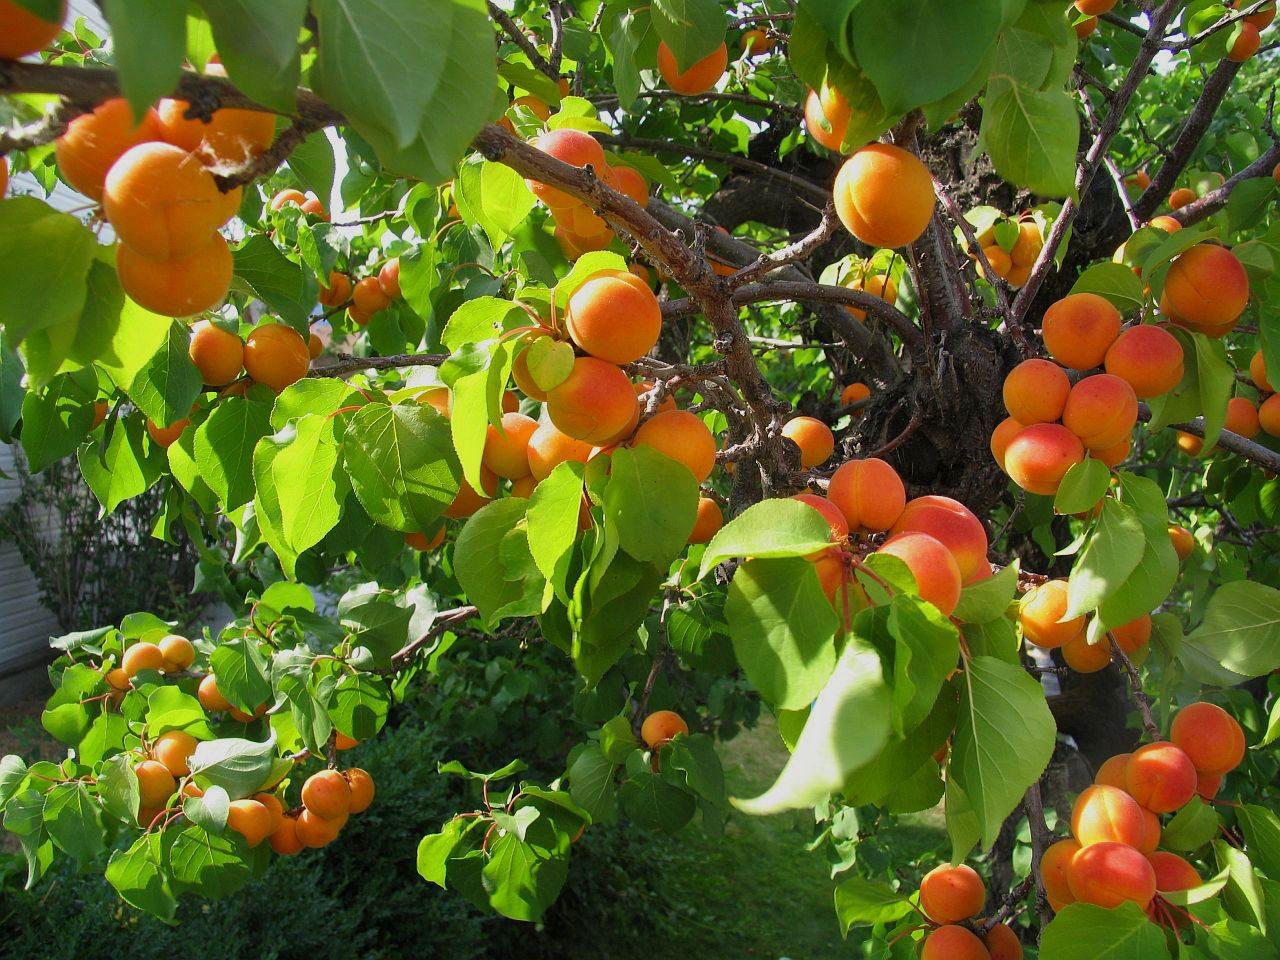 Increased abundance and brix (sweetness)